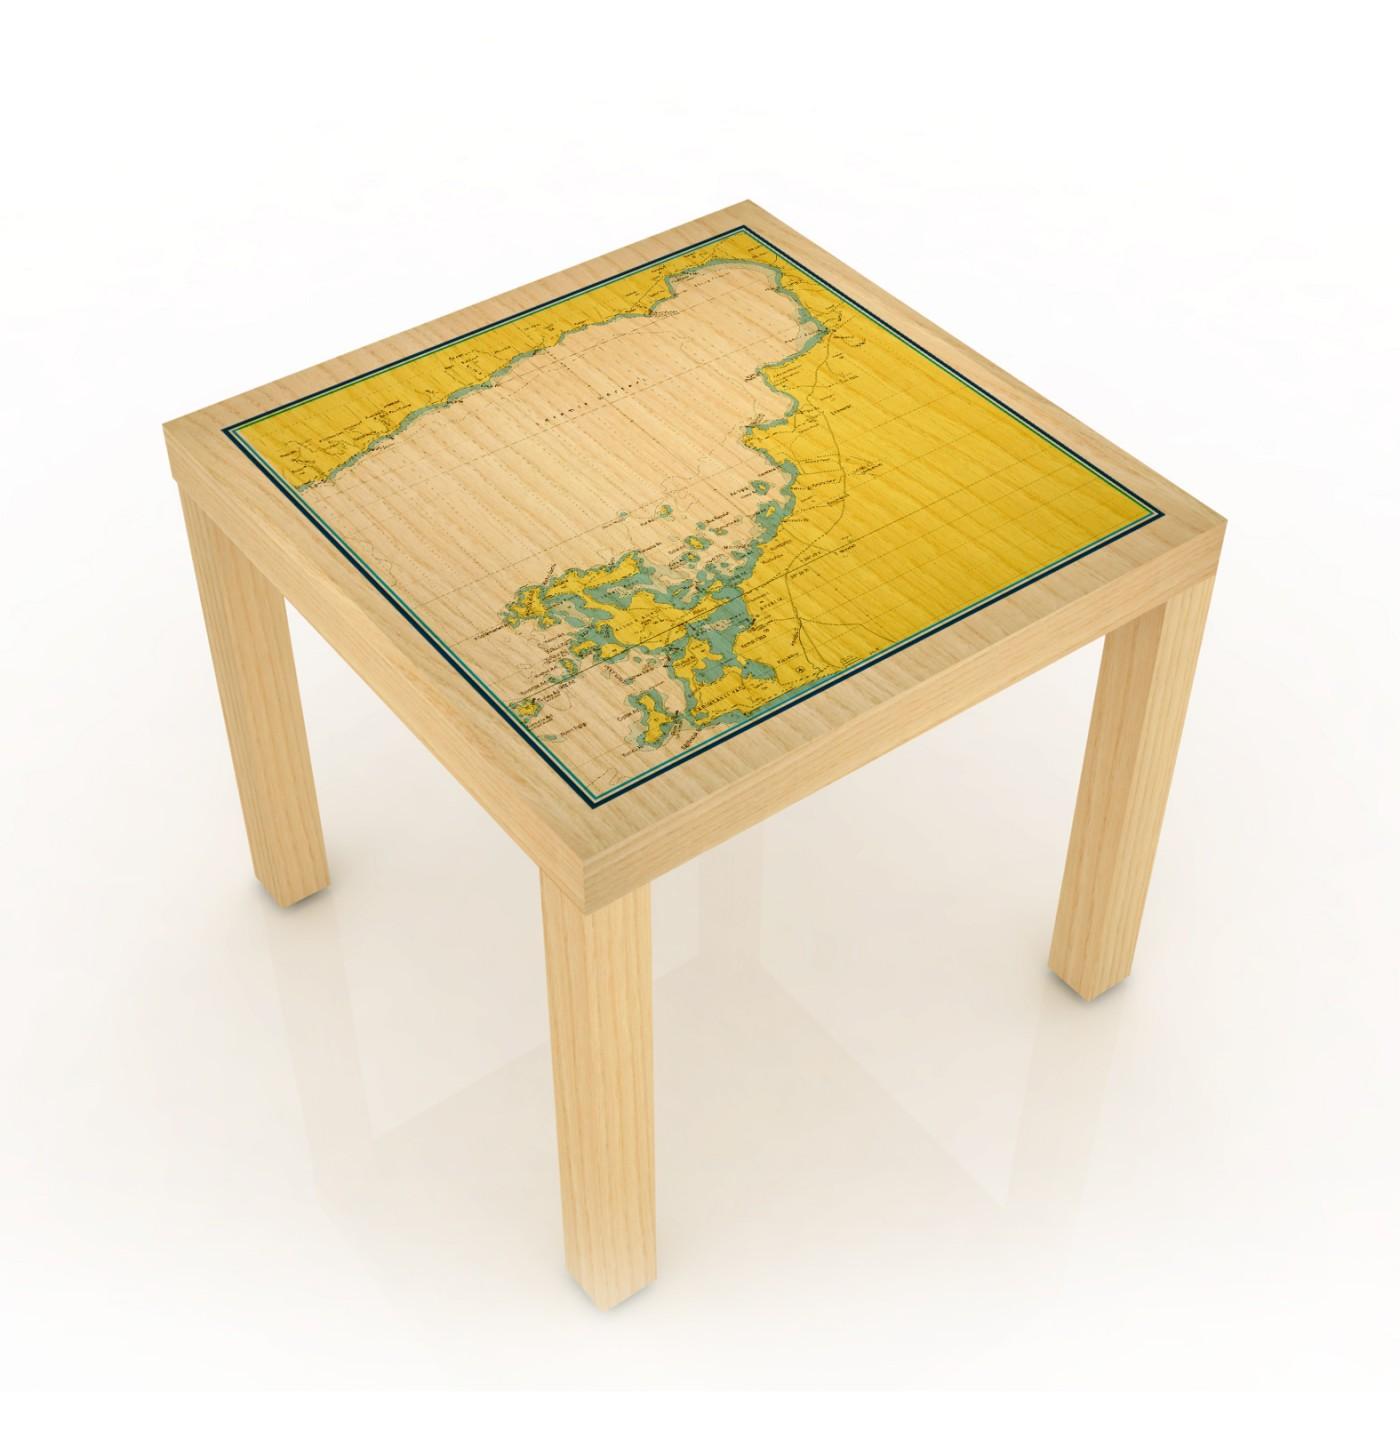 Ayvalık - Cunda  Marin Haritalı Sehpa